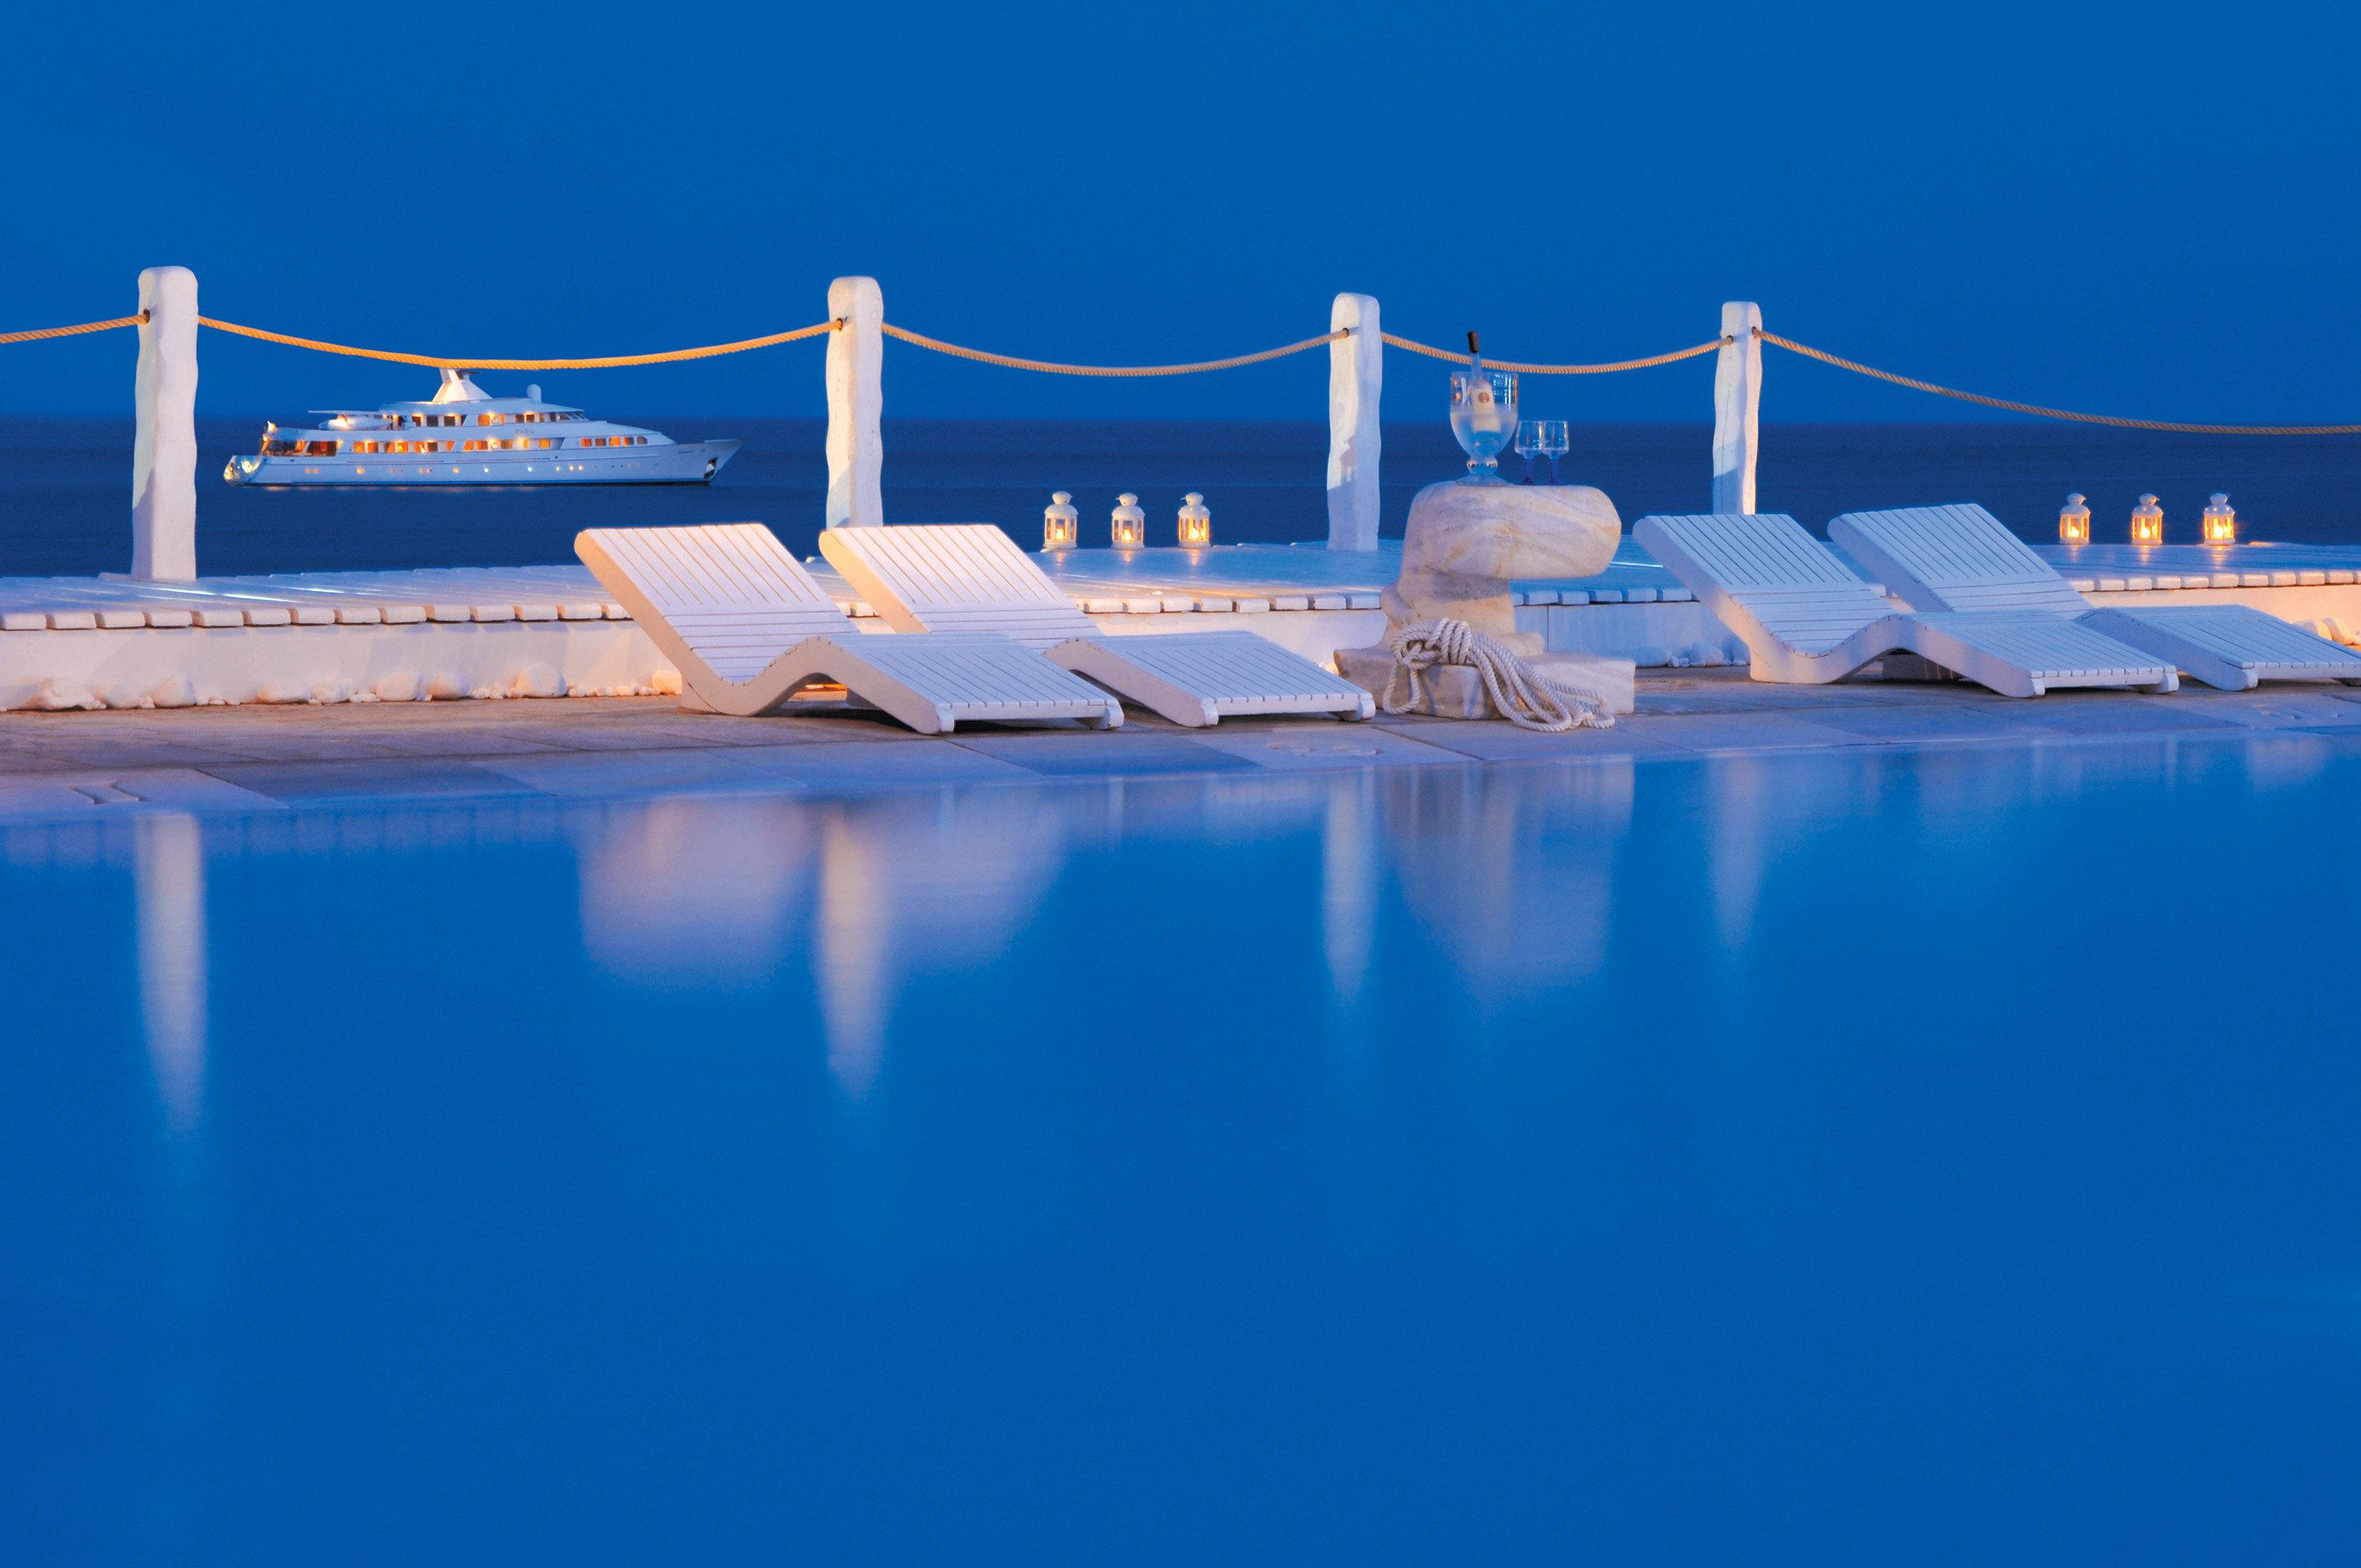 Hip Lounge Luxury Modern Pool sky vehicle water marina Boat dock swimming pool Sea blue watercraft